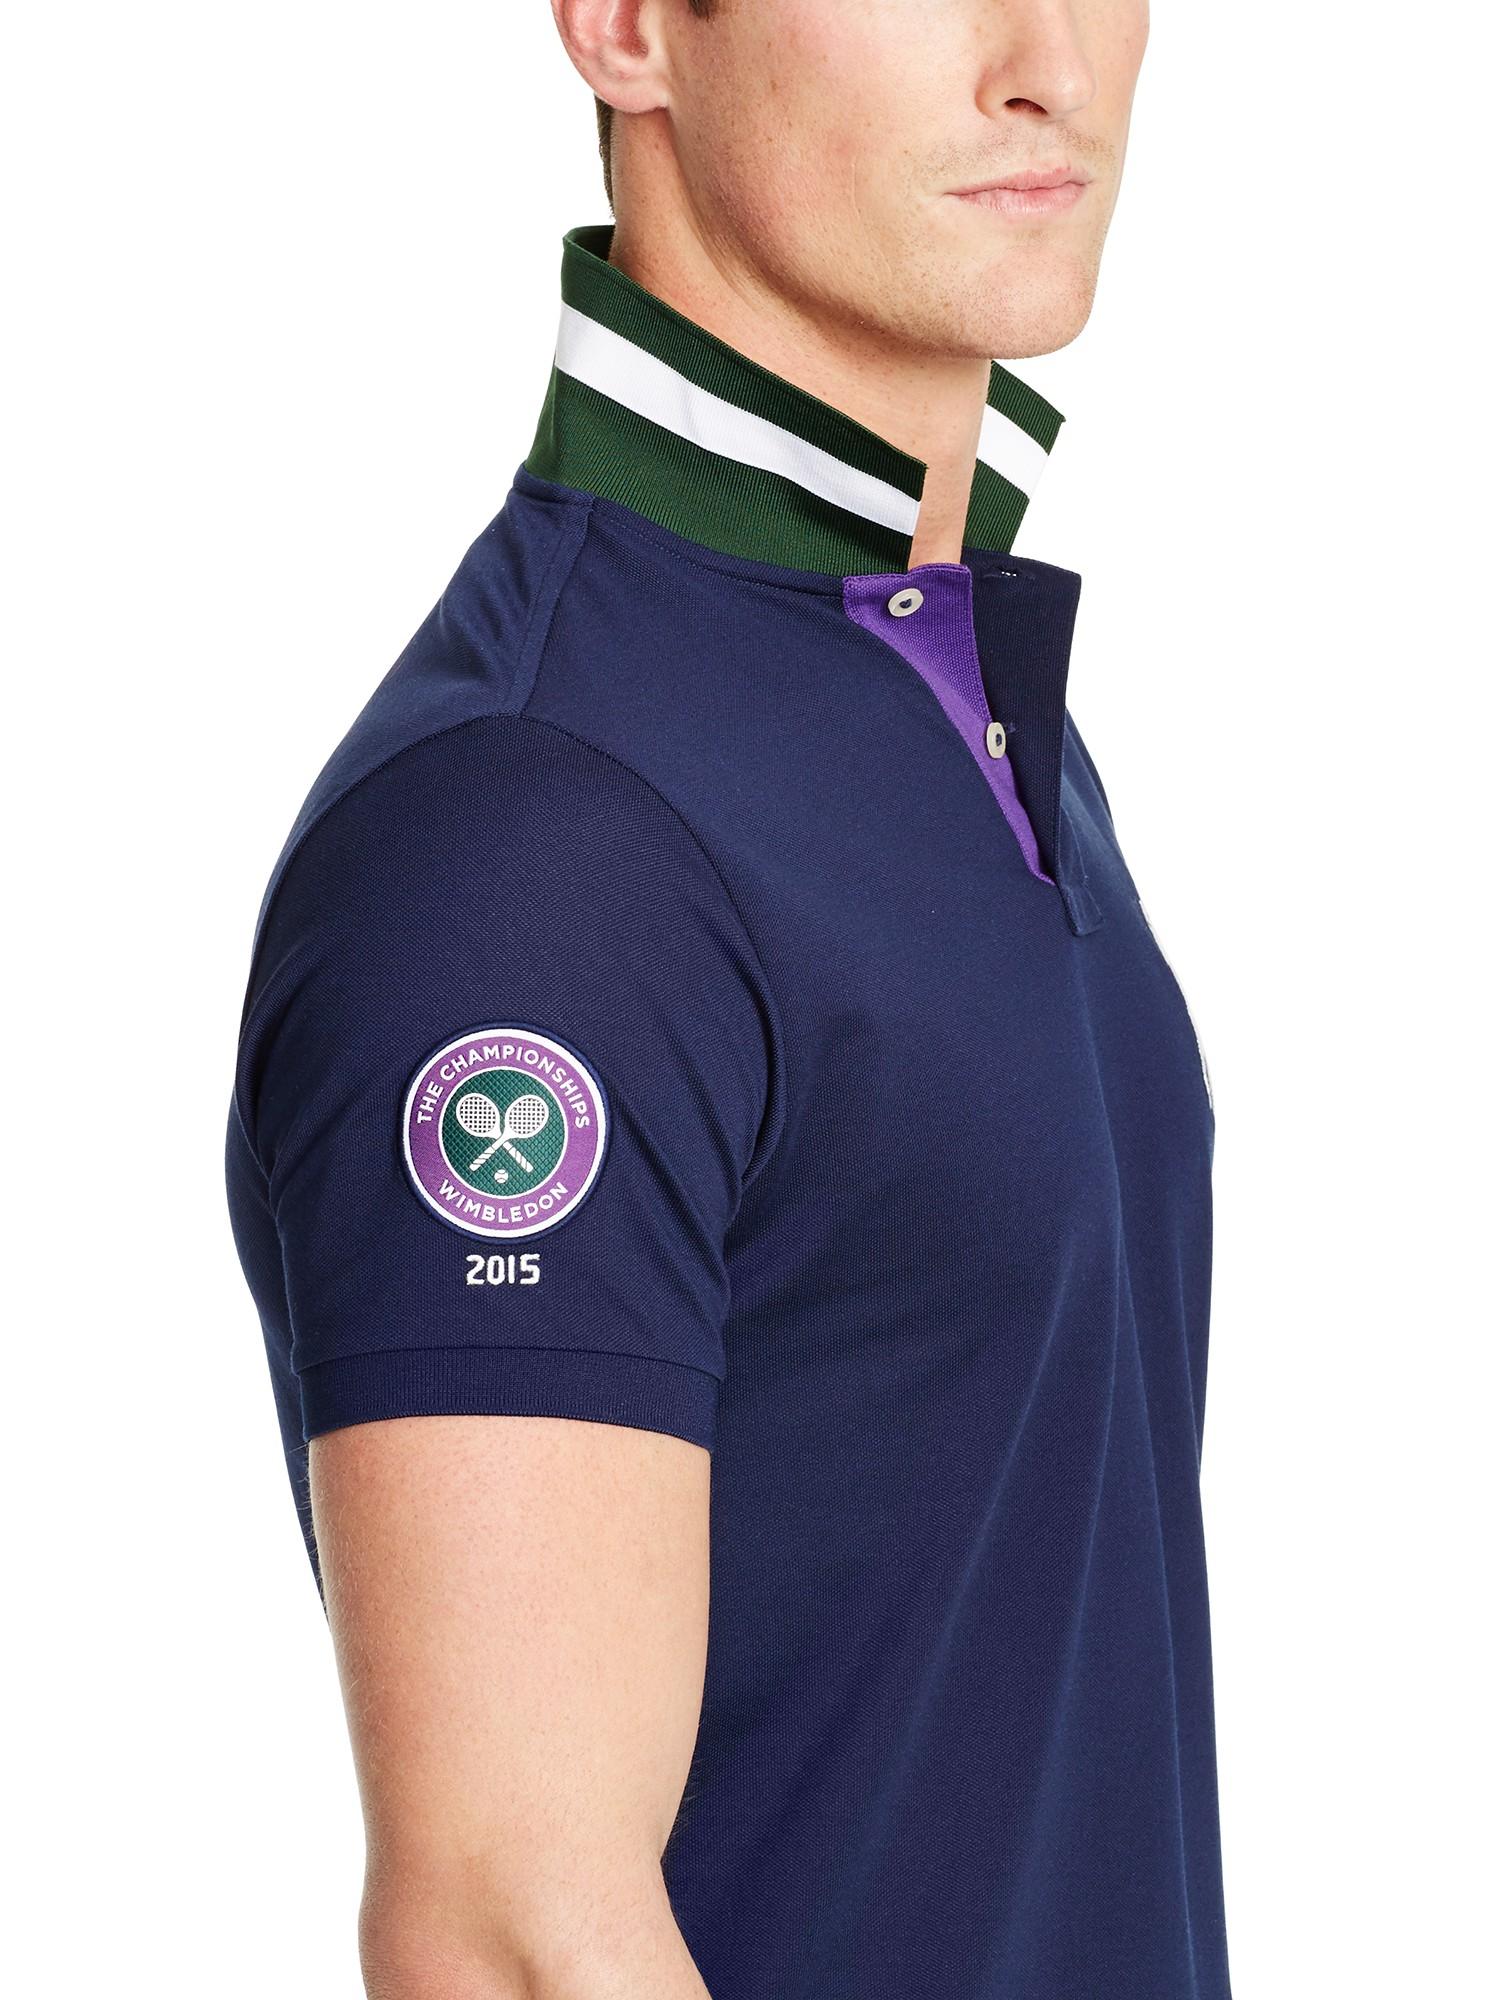 6f79ea42 ... sale polo ralph lauren wimbledon ball boy polo shirt in blue for men  lyst 1ad64 708c4